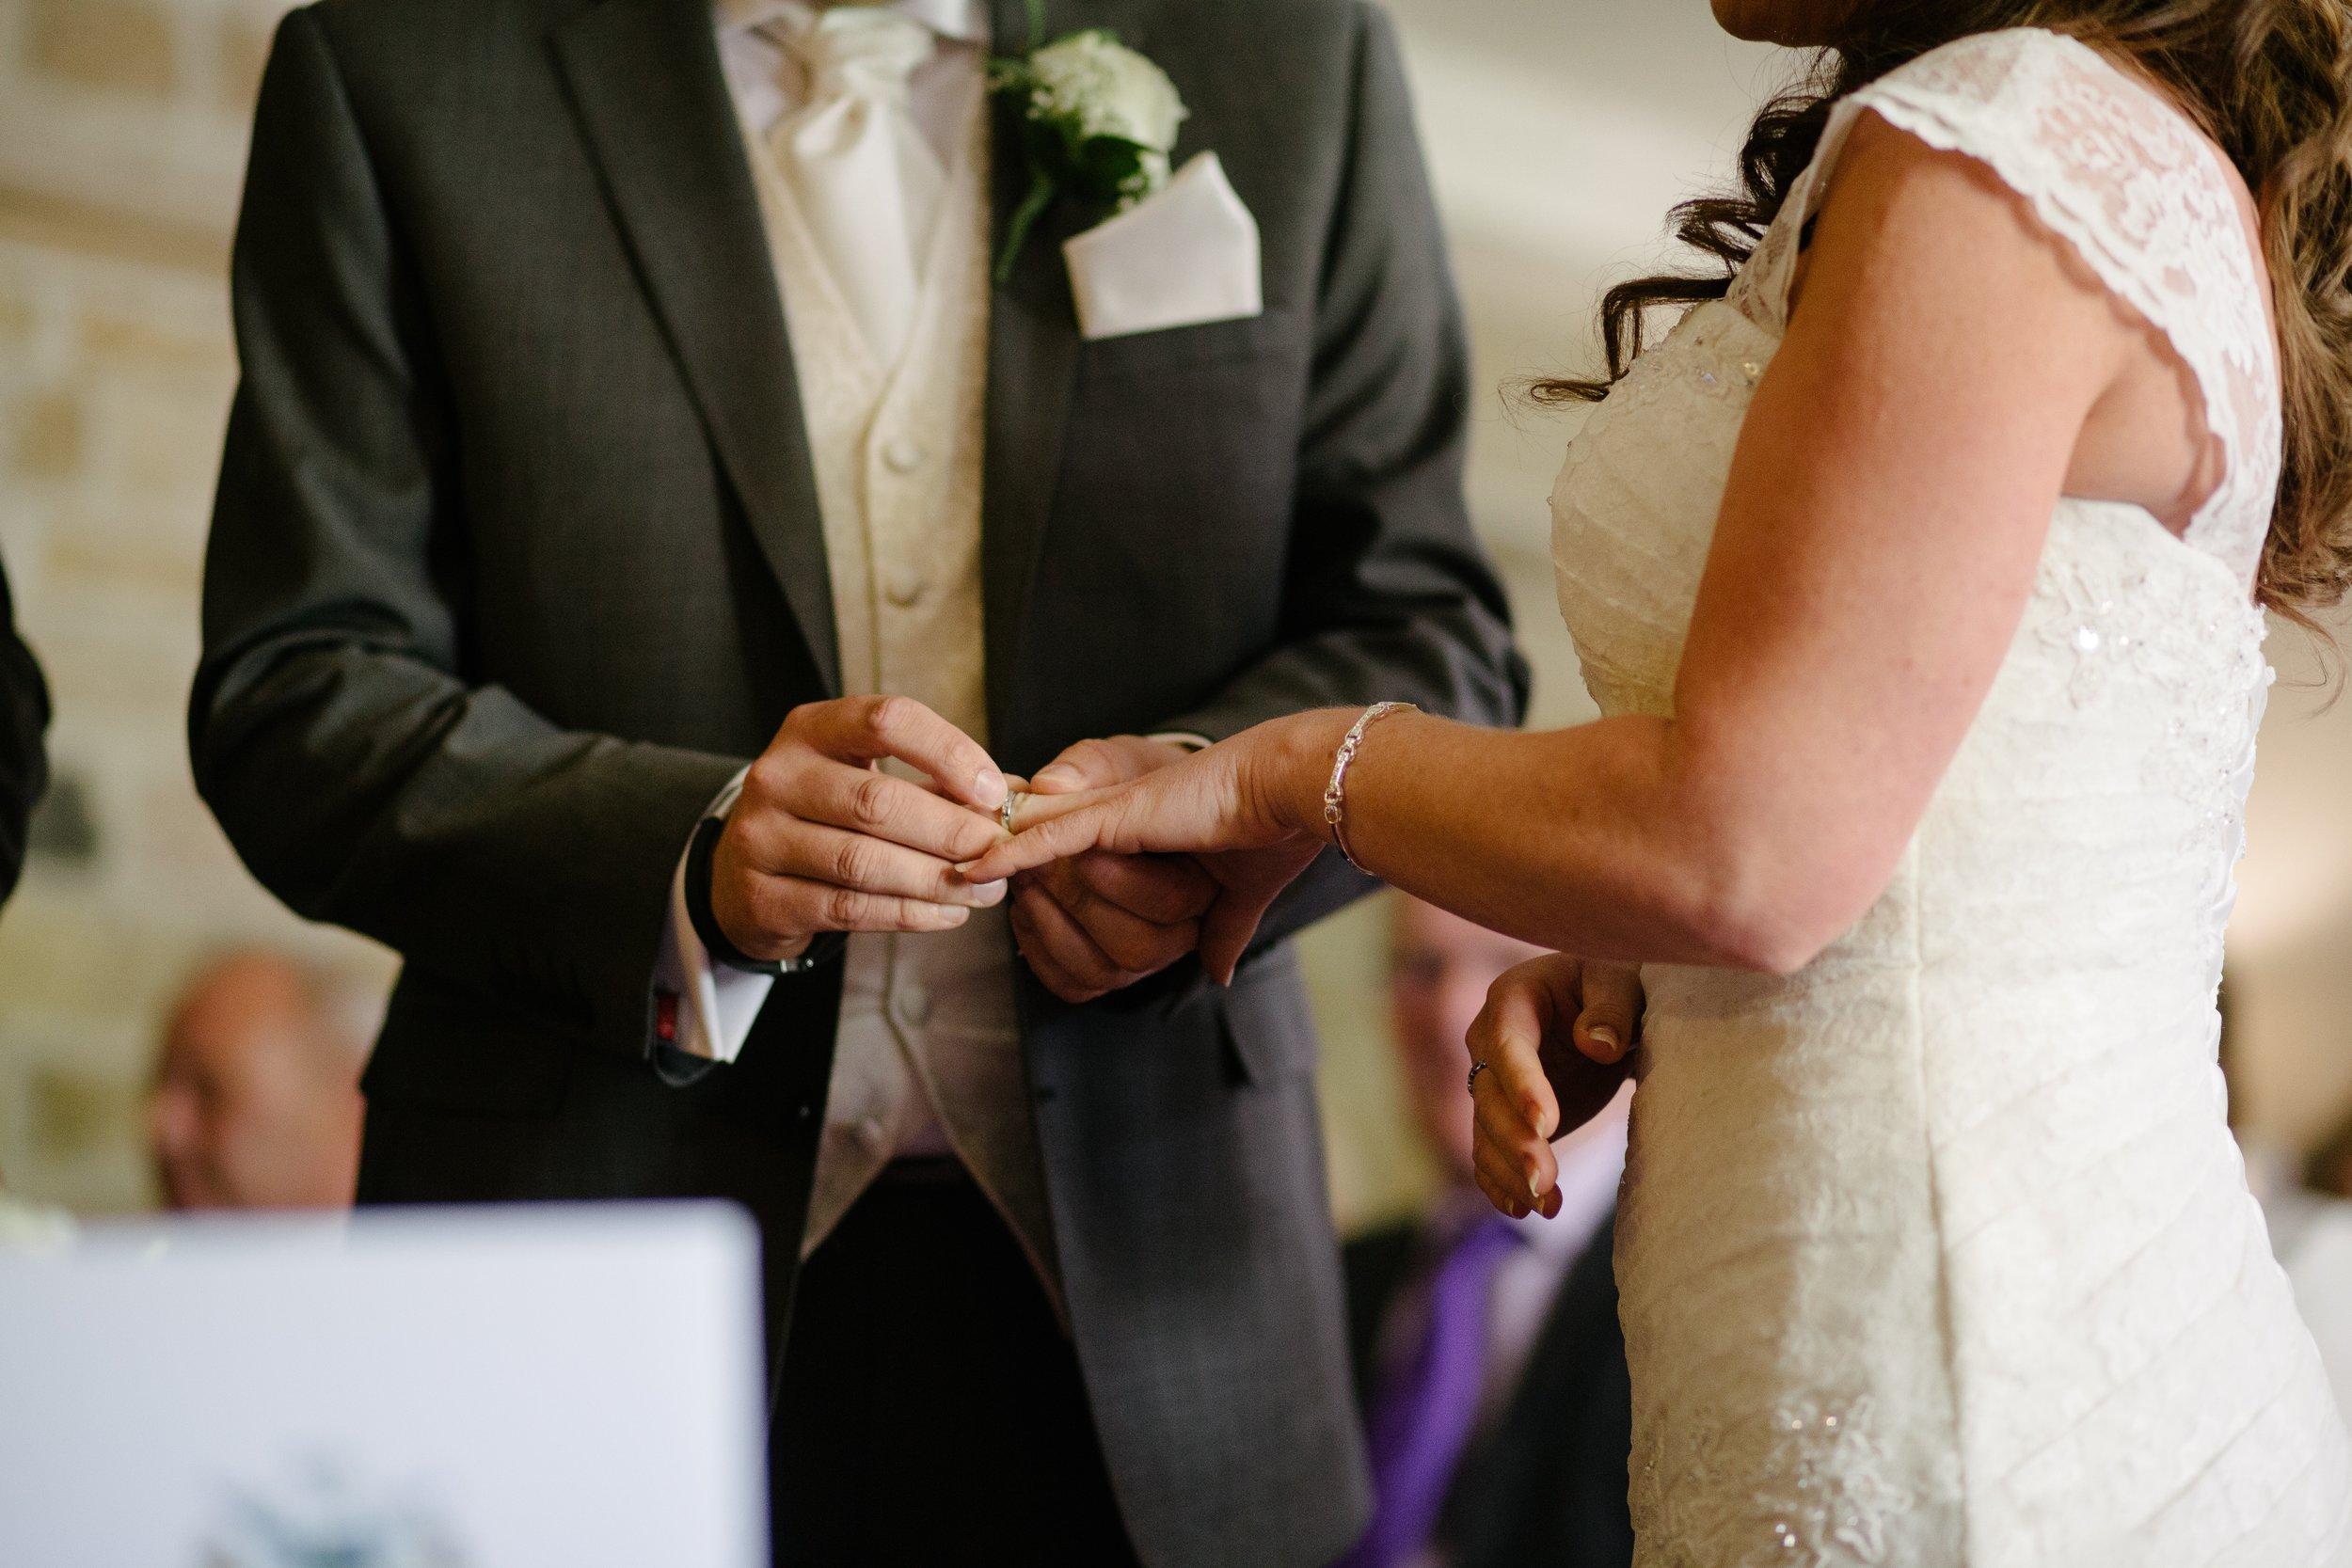 groom puts ring on bride's finger columbus, ohio wedding officiant